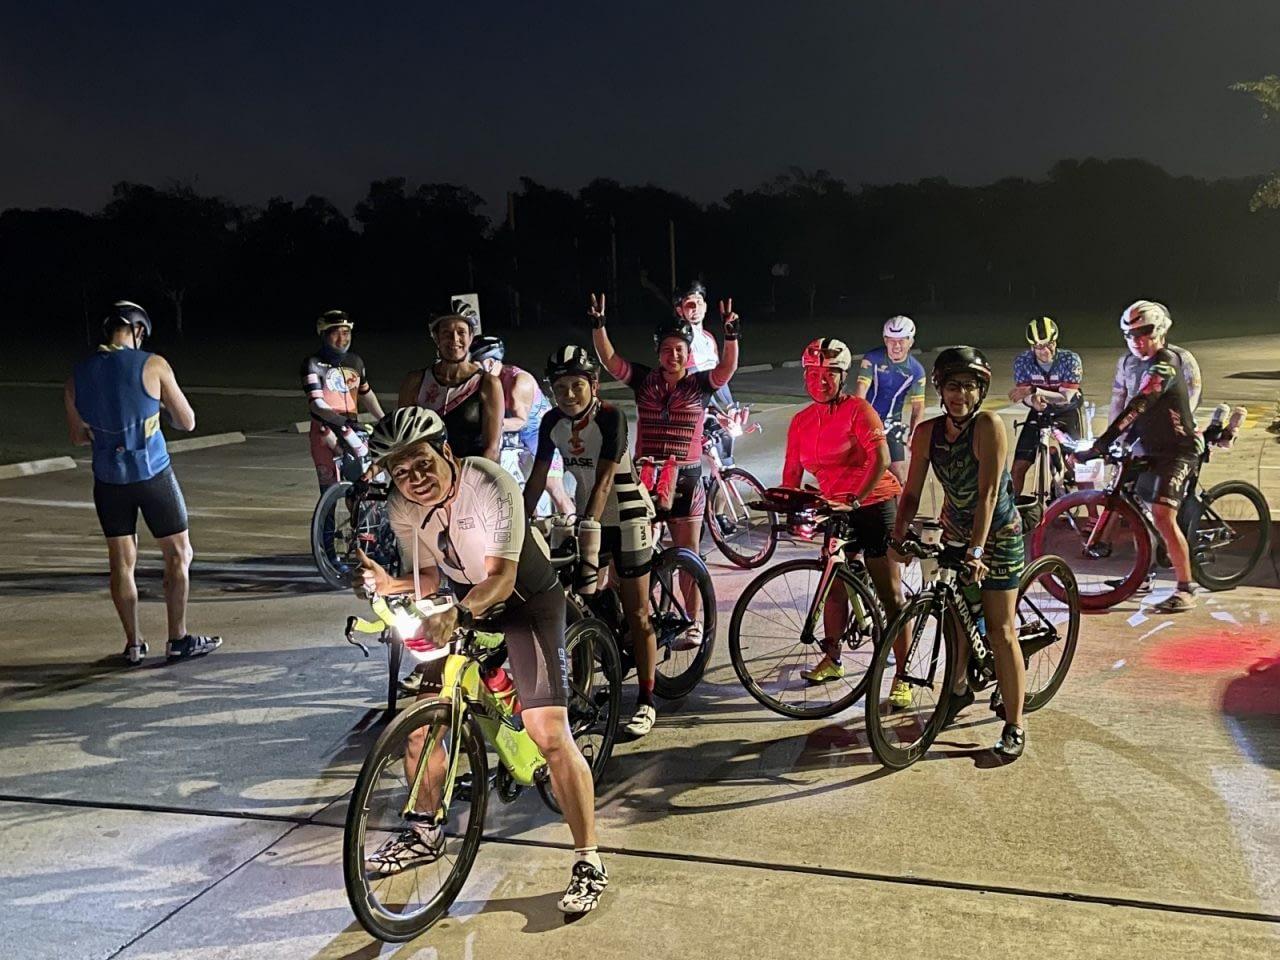 The tension between pushing hard vs riding to plan